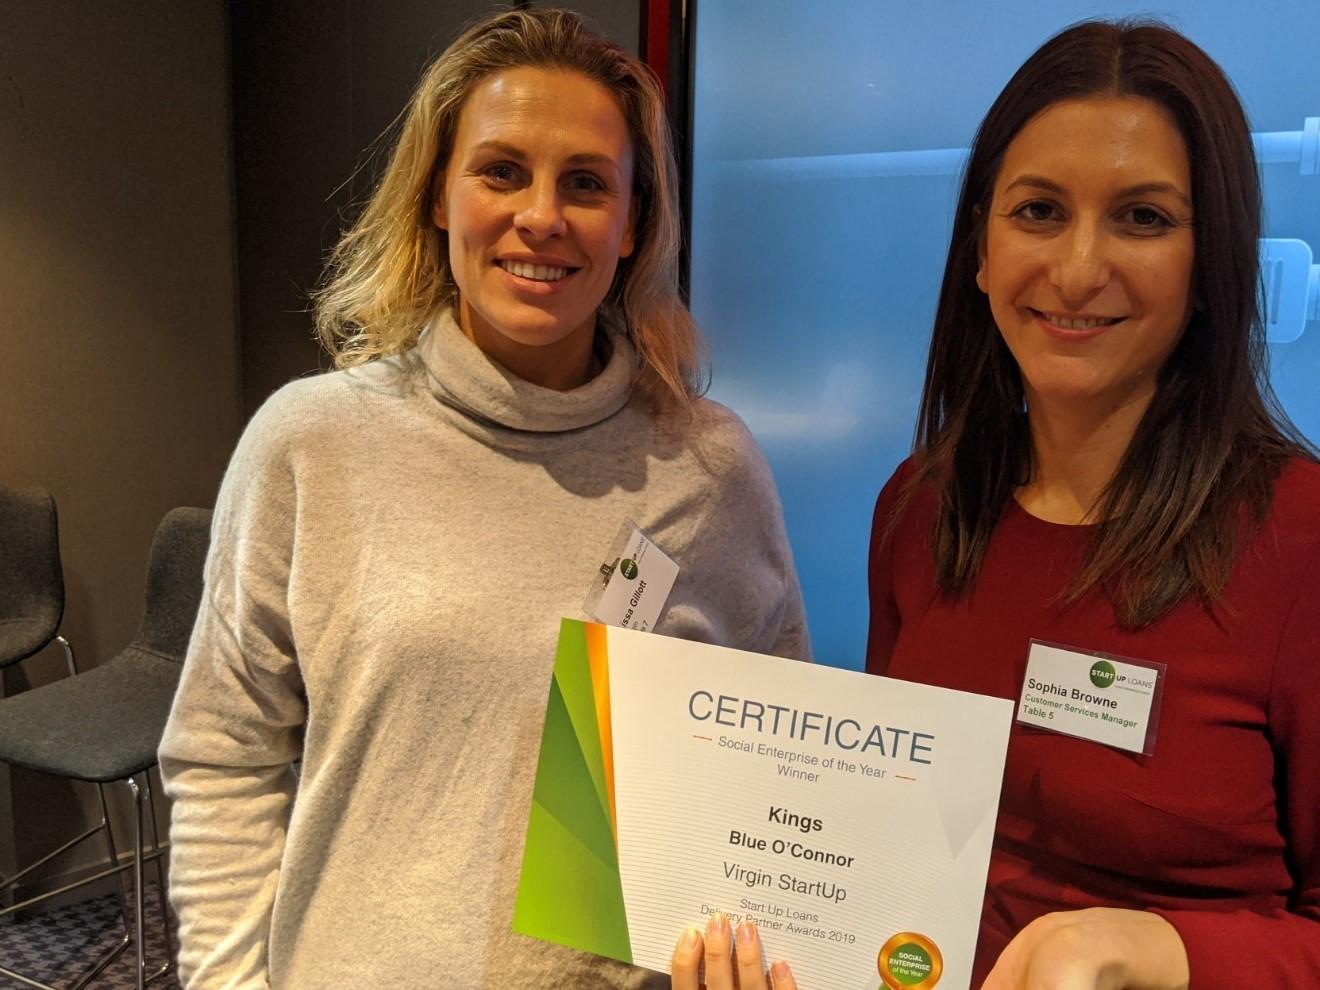 Sophia Browne presenting a certificate to Virgin StartUp